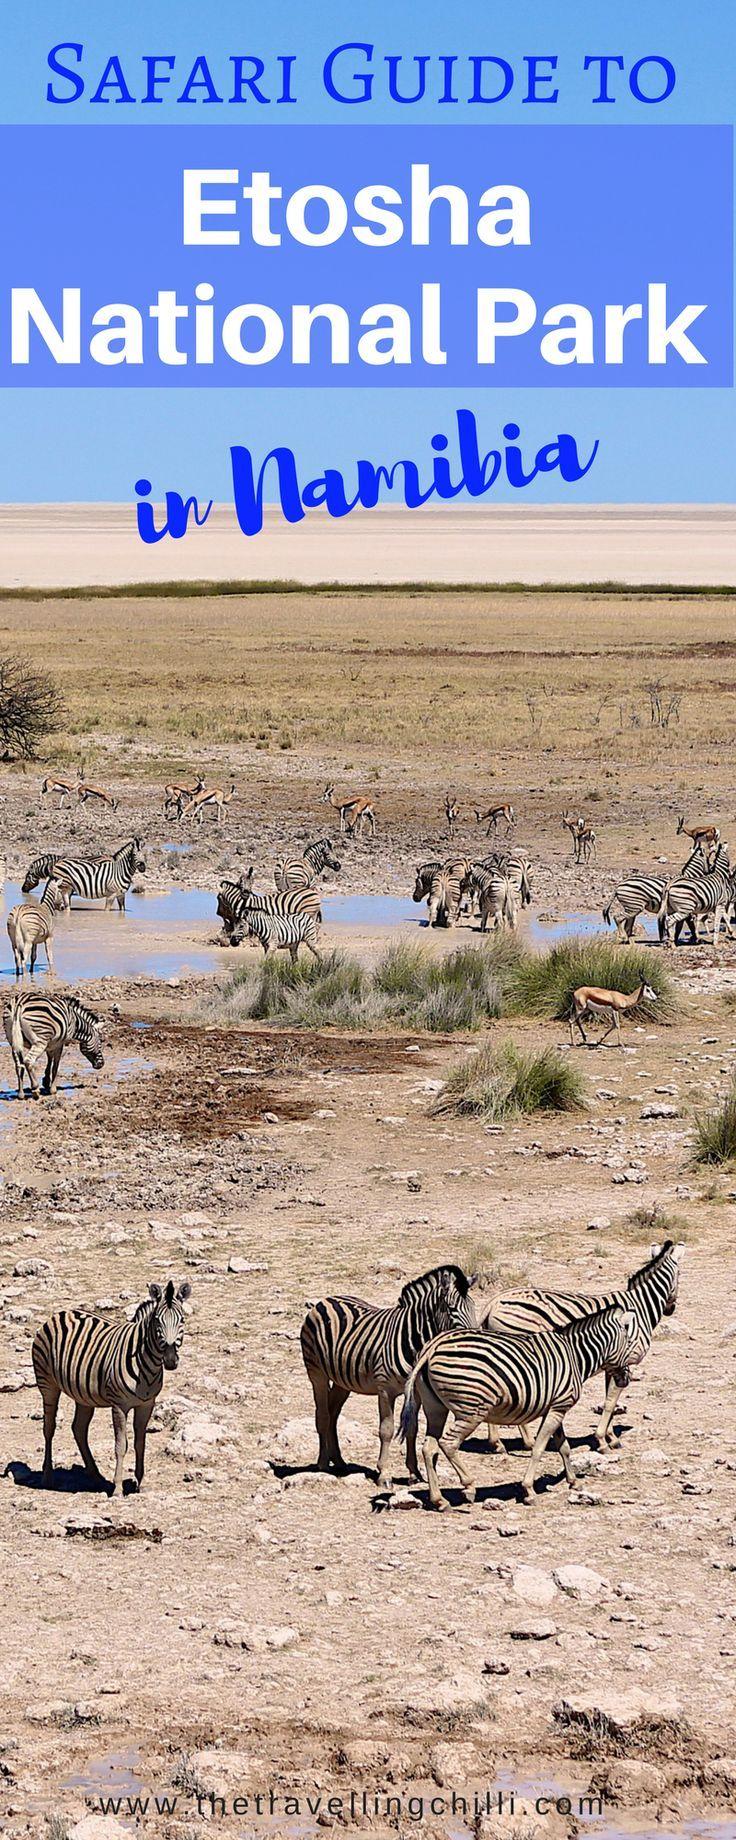 Safari guide to Etosha National Park in Namibia | Waterhole safari in Etosha National Park Namibia *********************************** #Namibia #EtoshaNationalPark #Africansafari #Wildlife